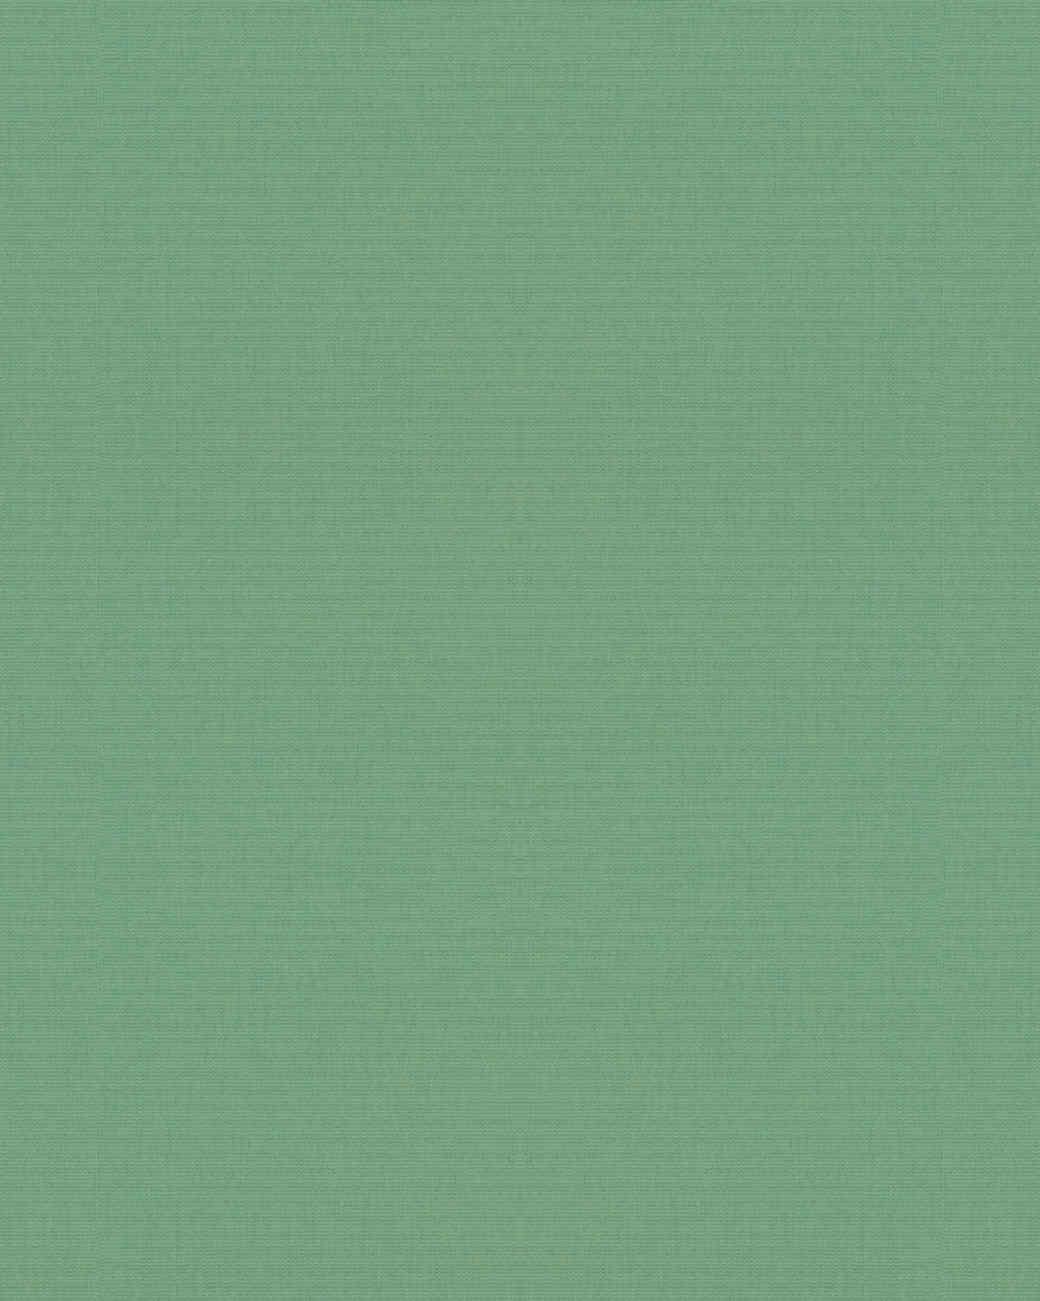 calicocorners-basil-000275027.jpg